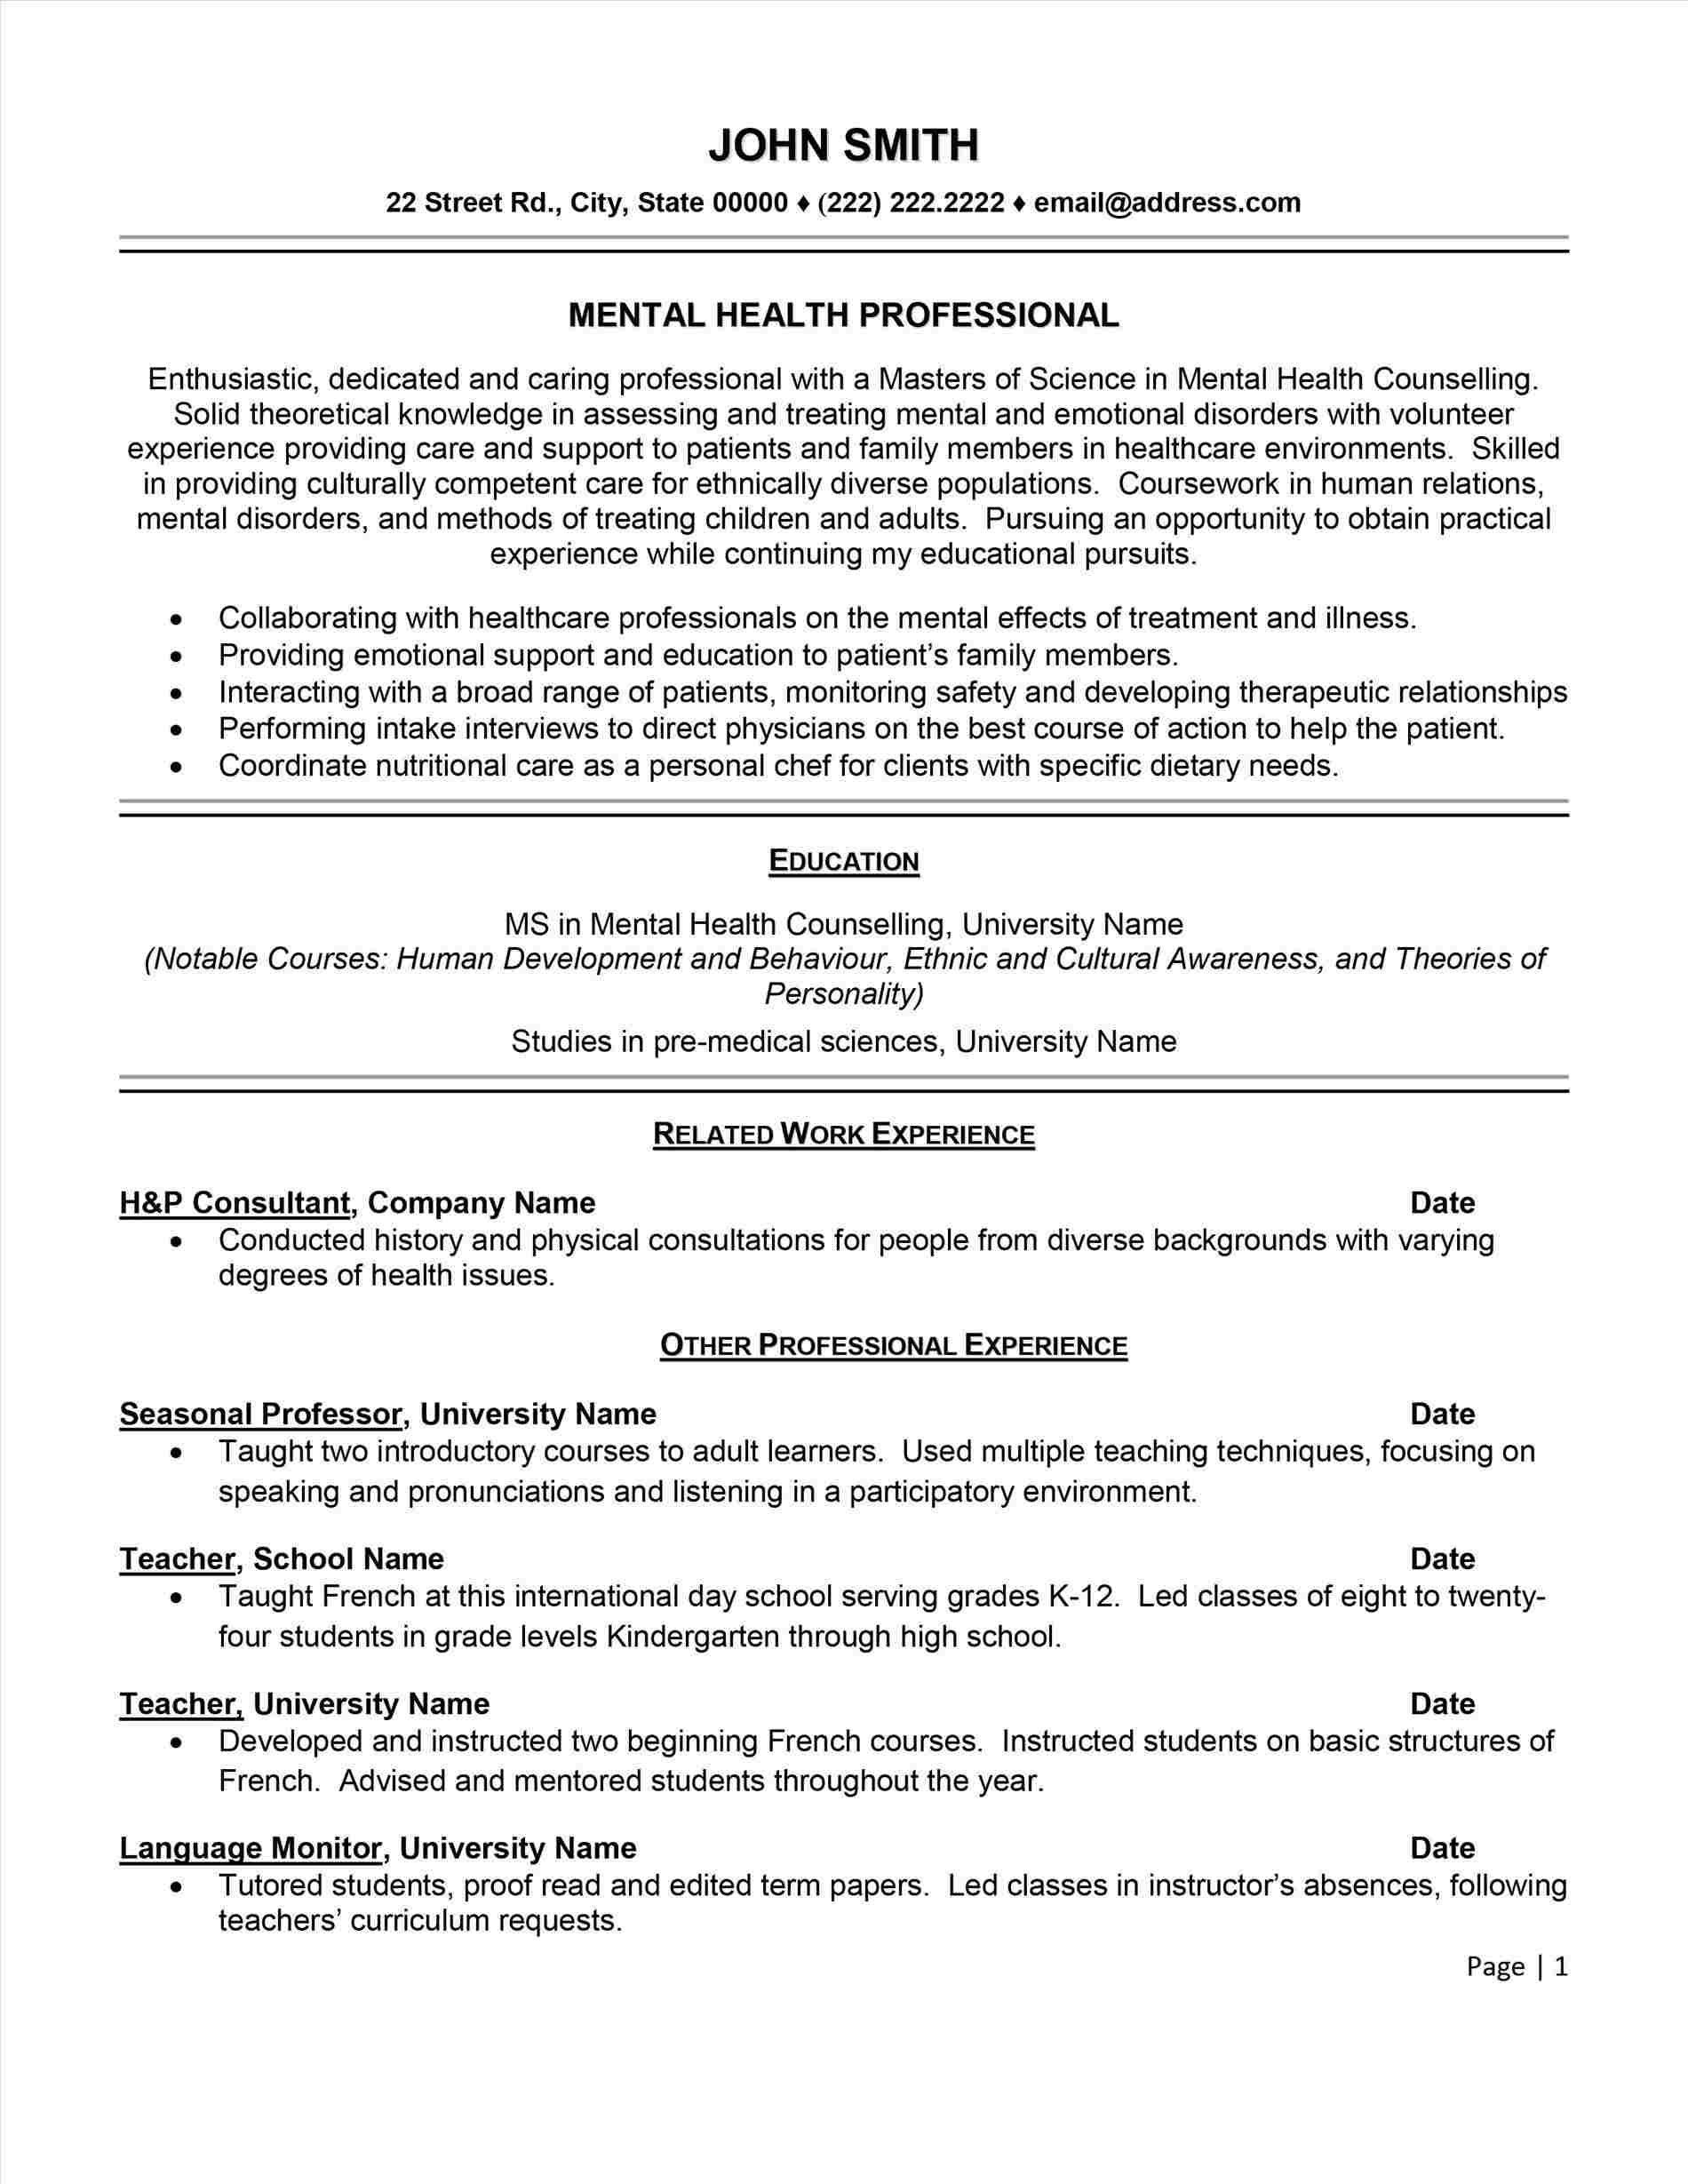 resume template 101 - Teriz.yasamayolver.com